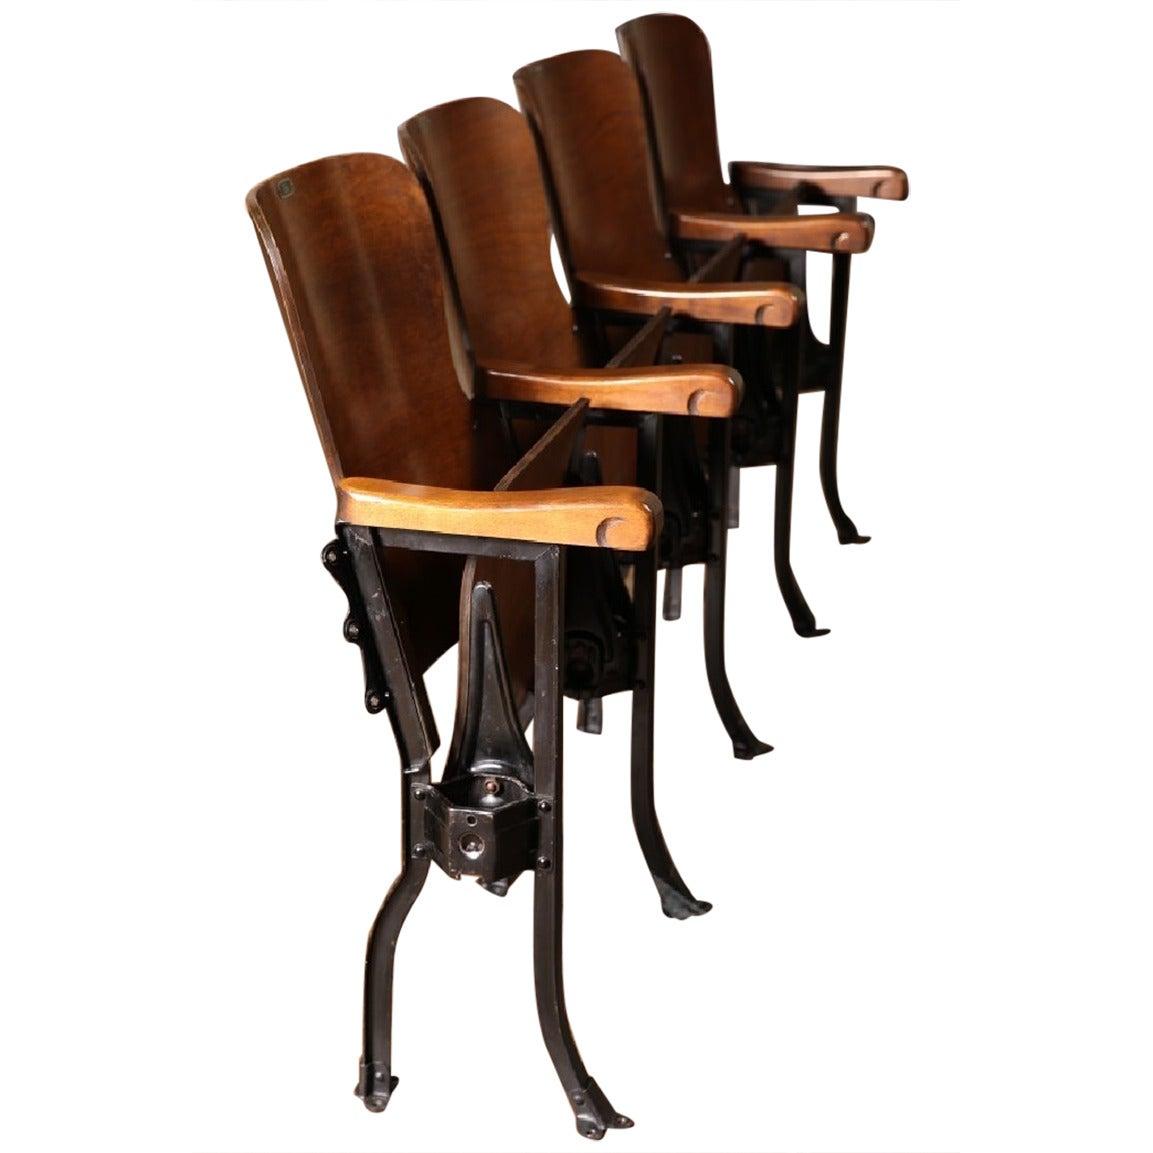 Vintage Theatre Seats 10